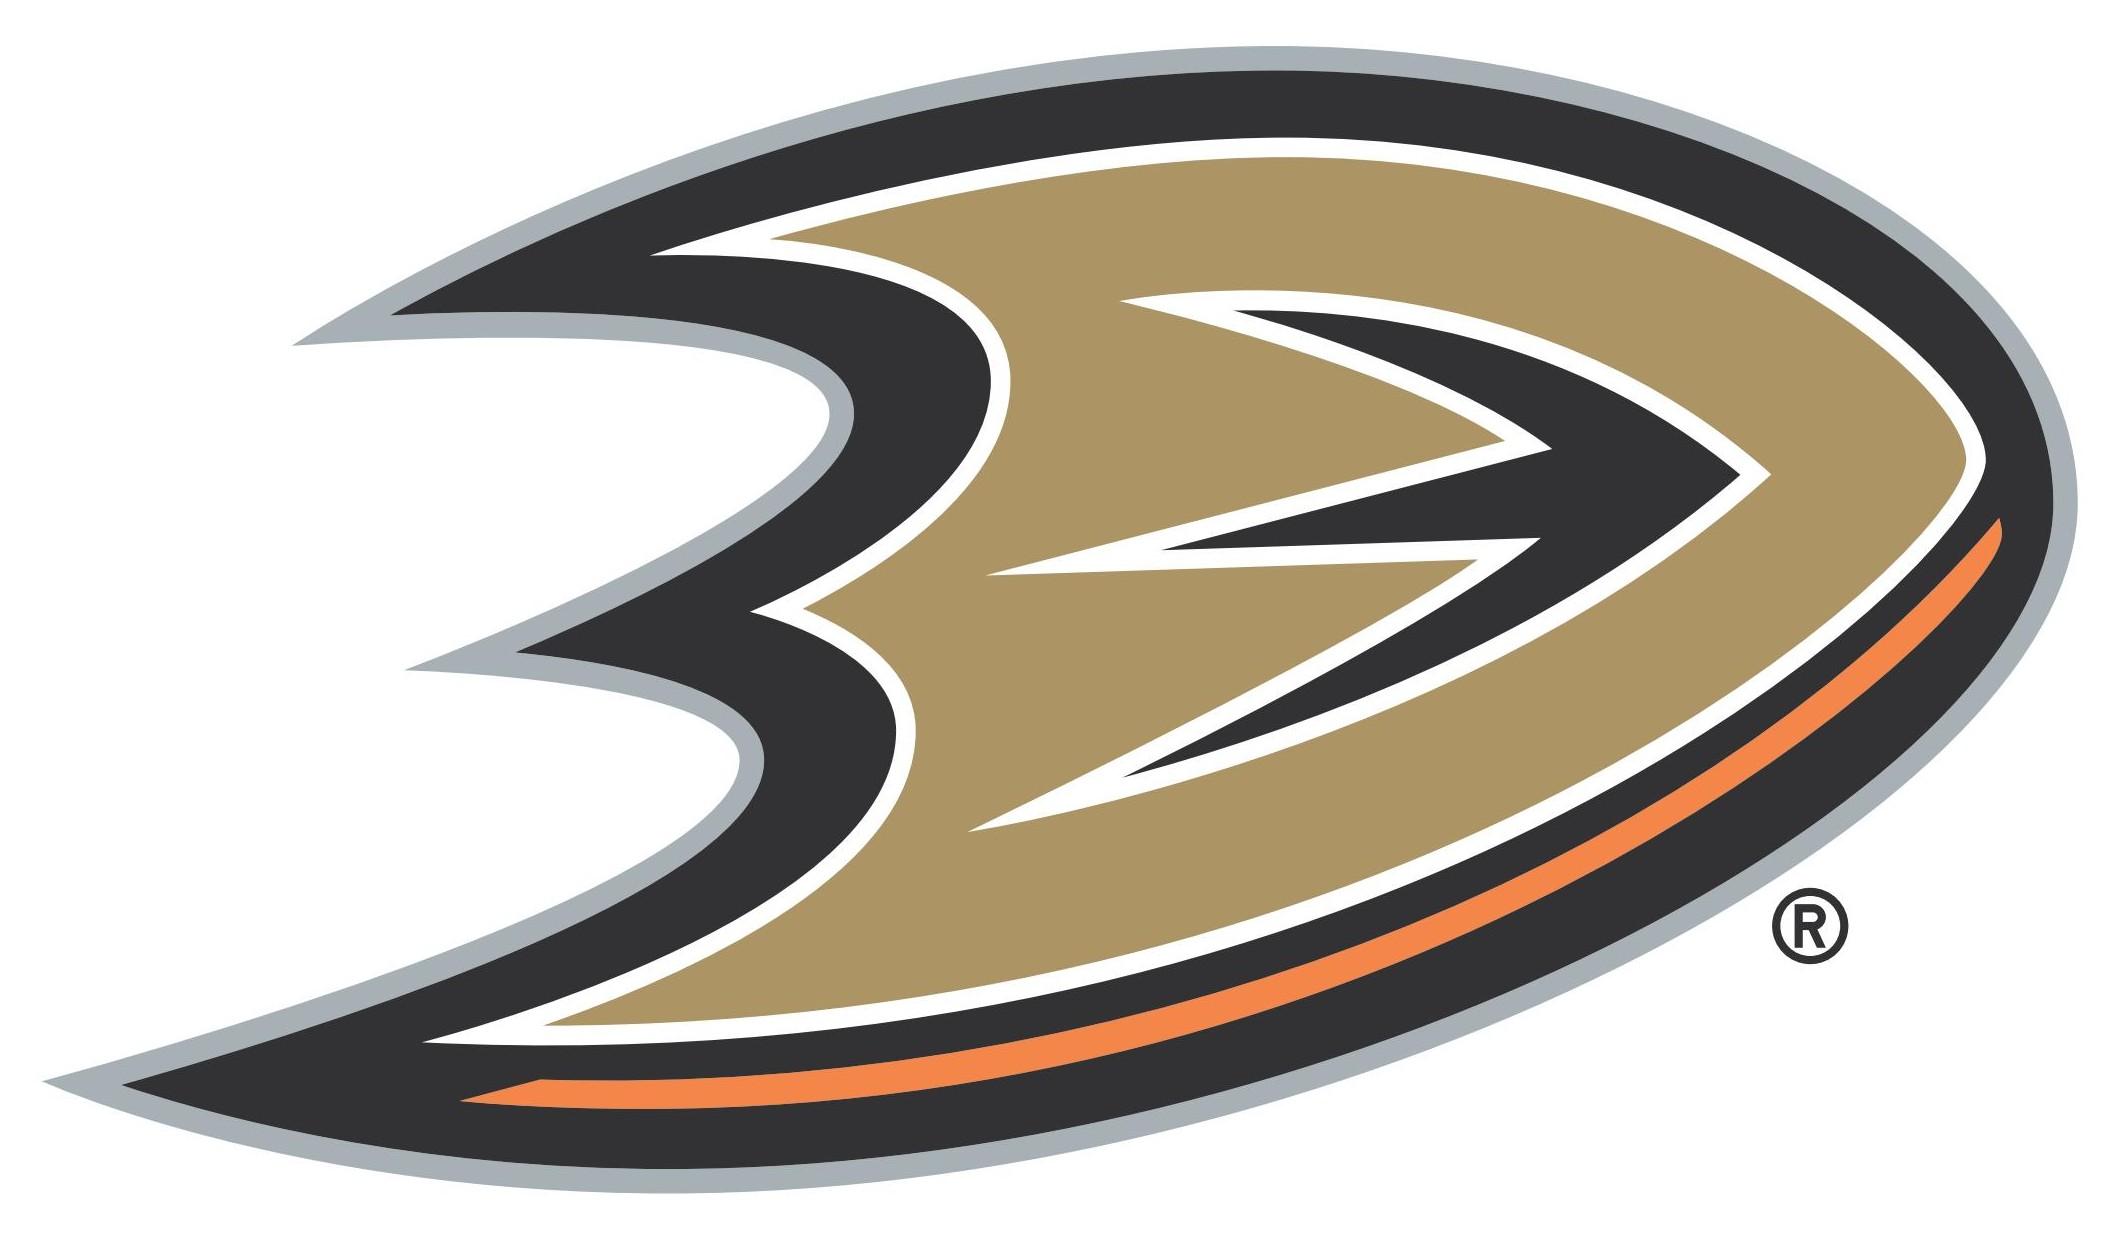 Anaheim ducks clipart.